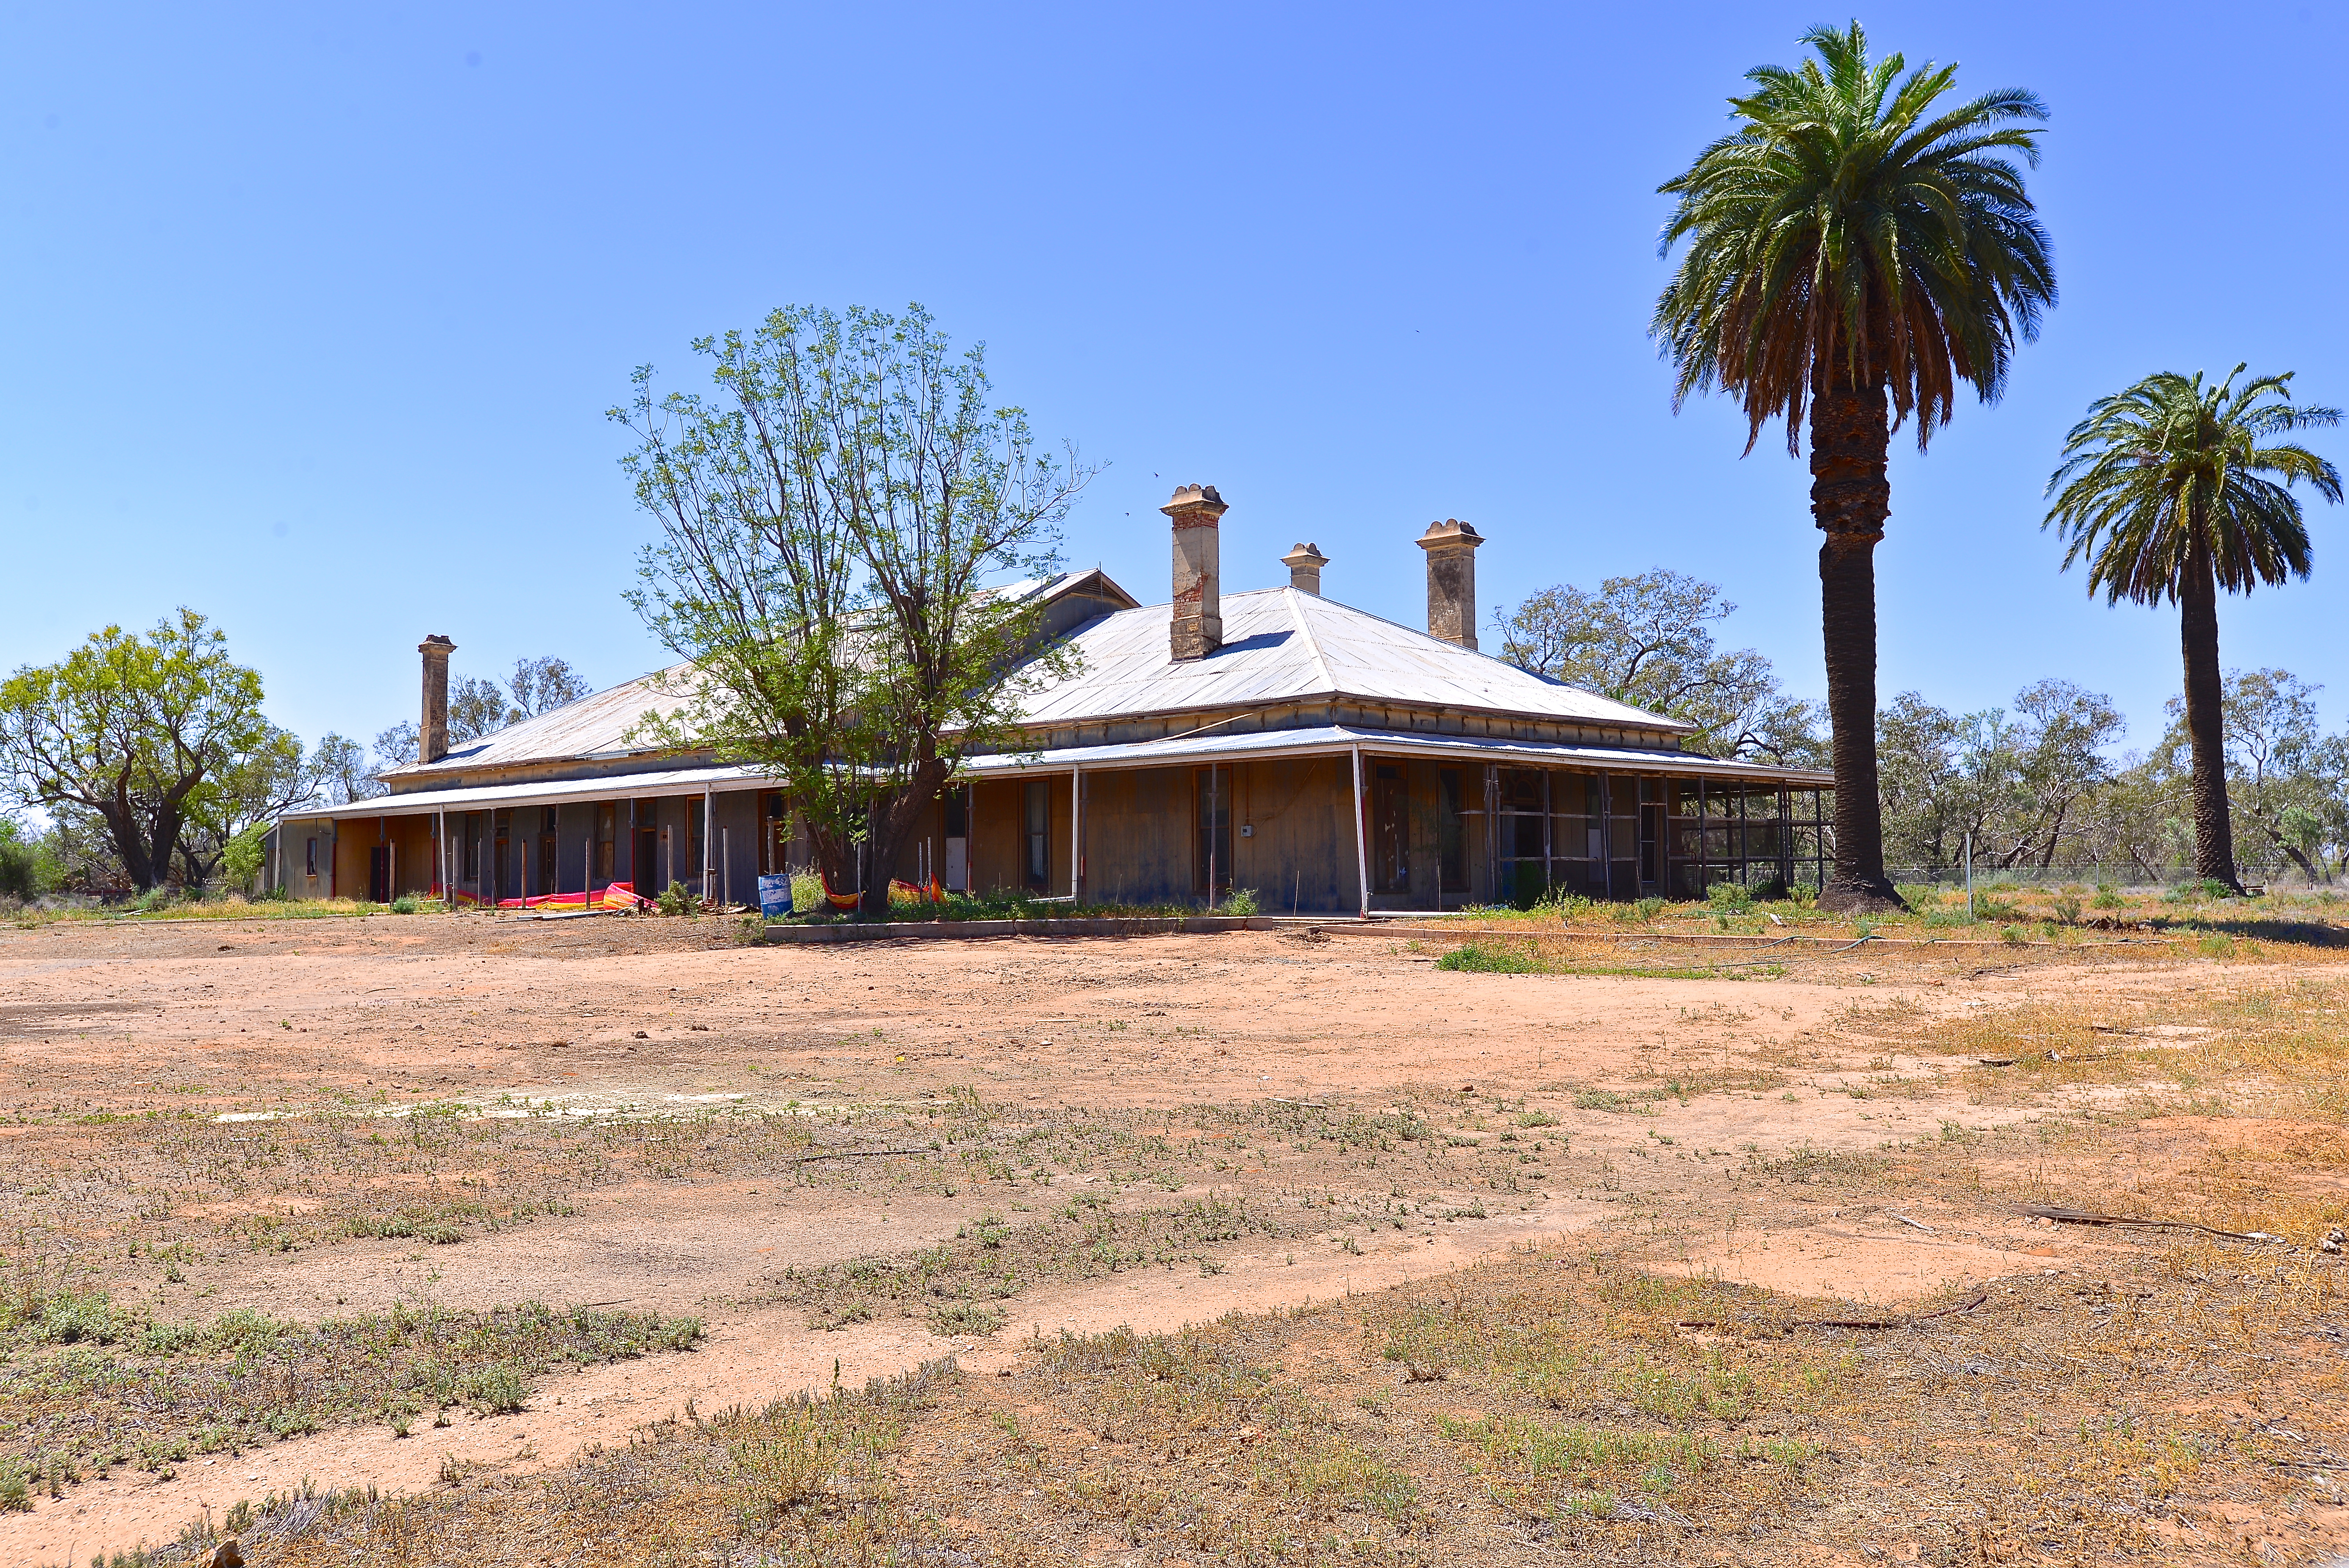 Toorale National Park Homestead Outback Australia